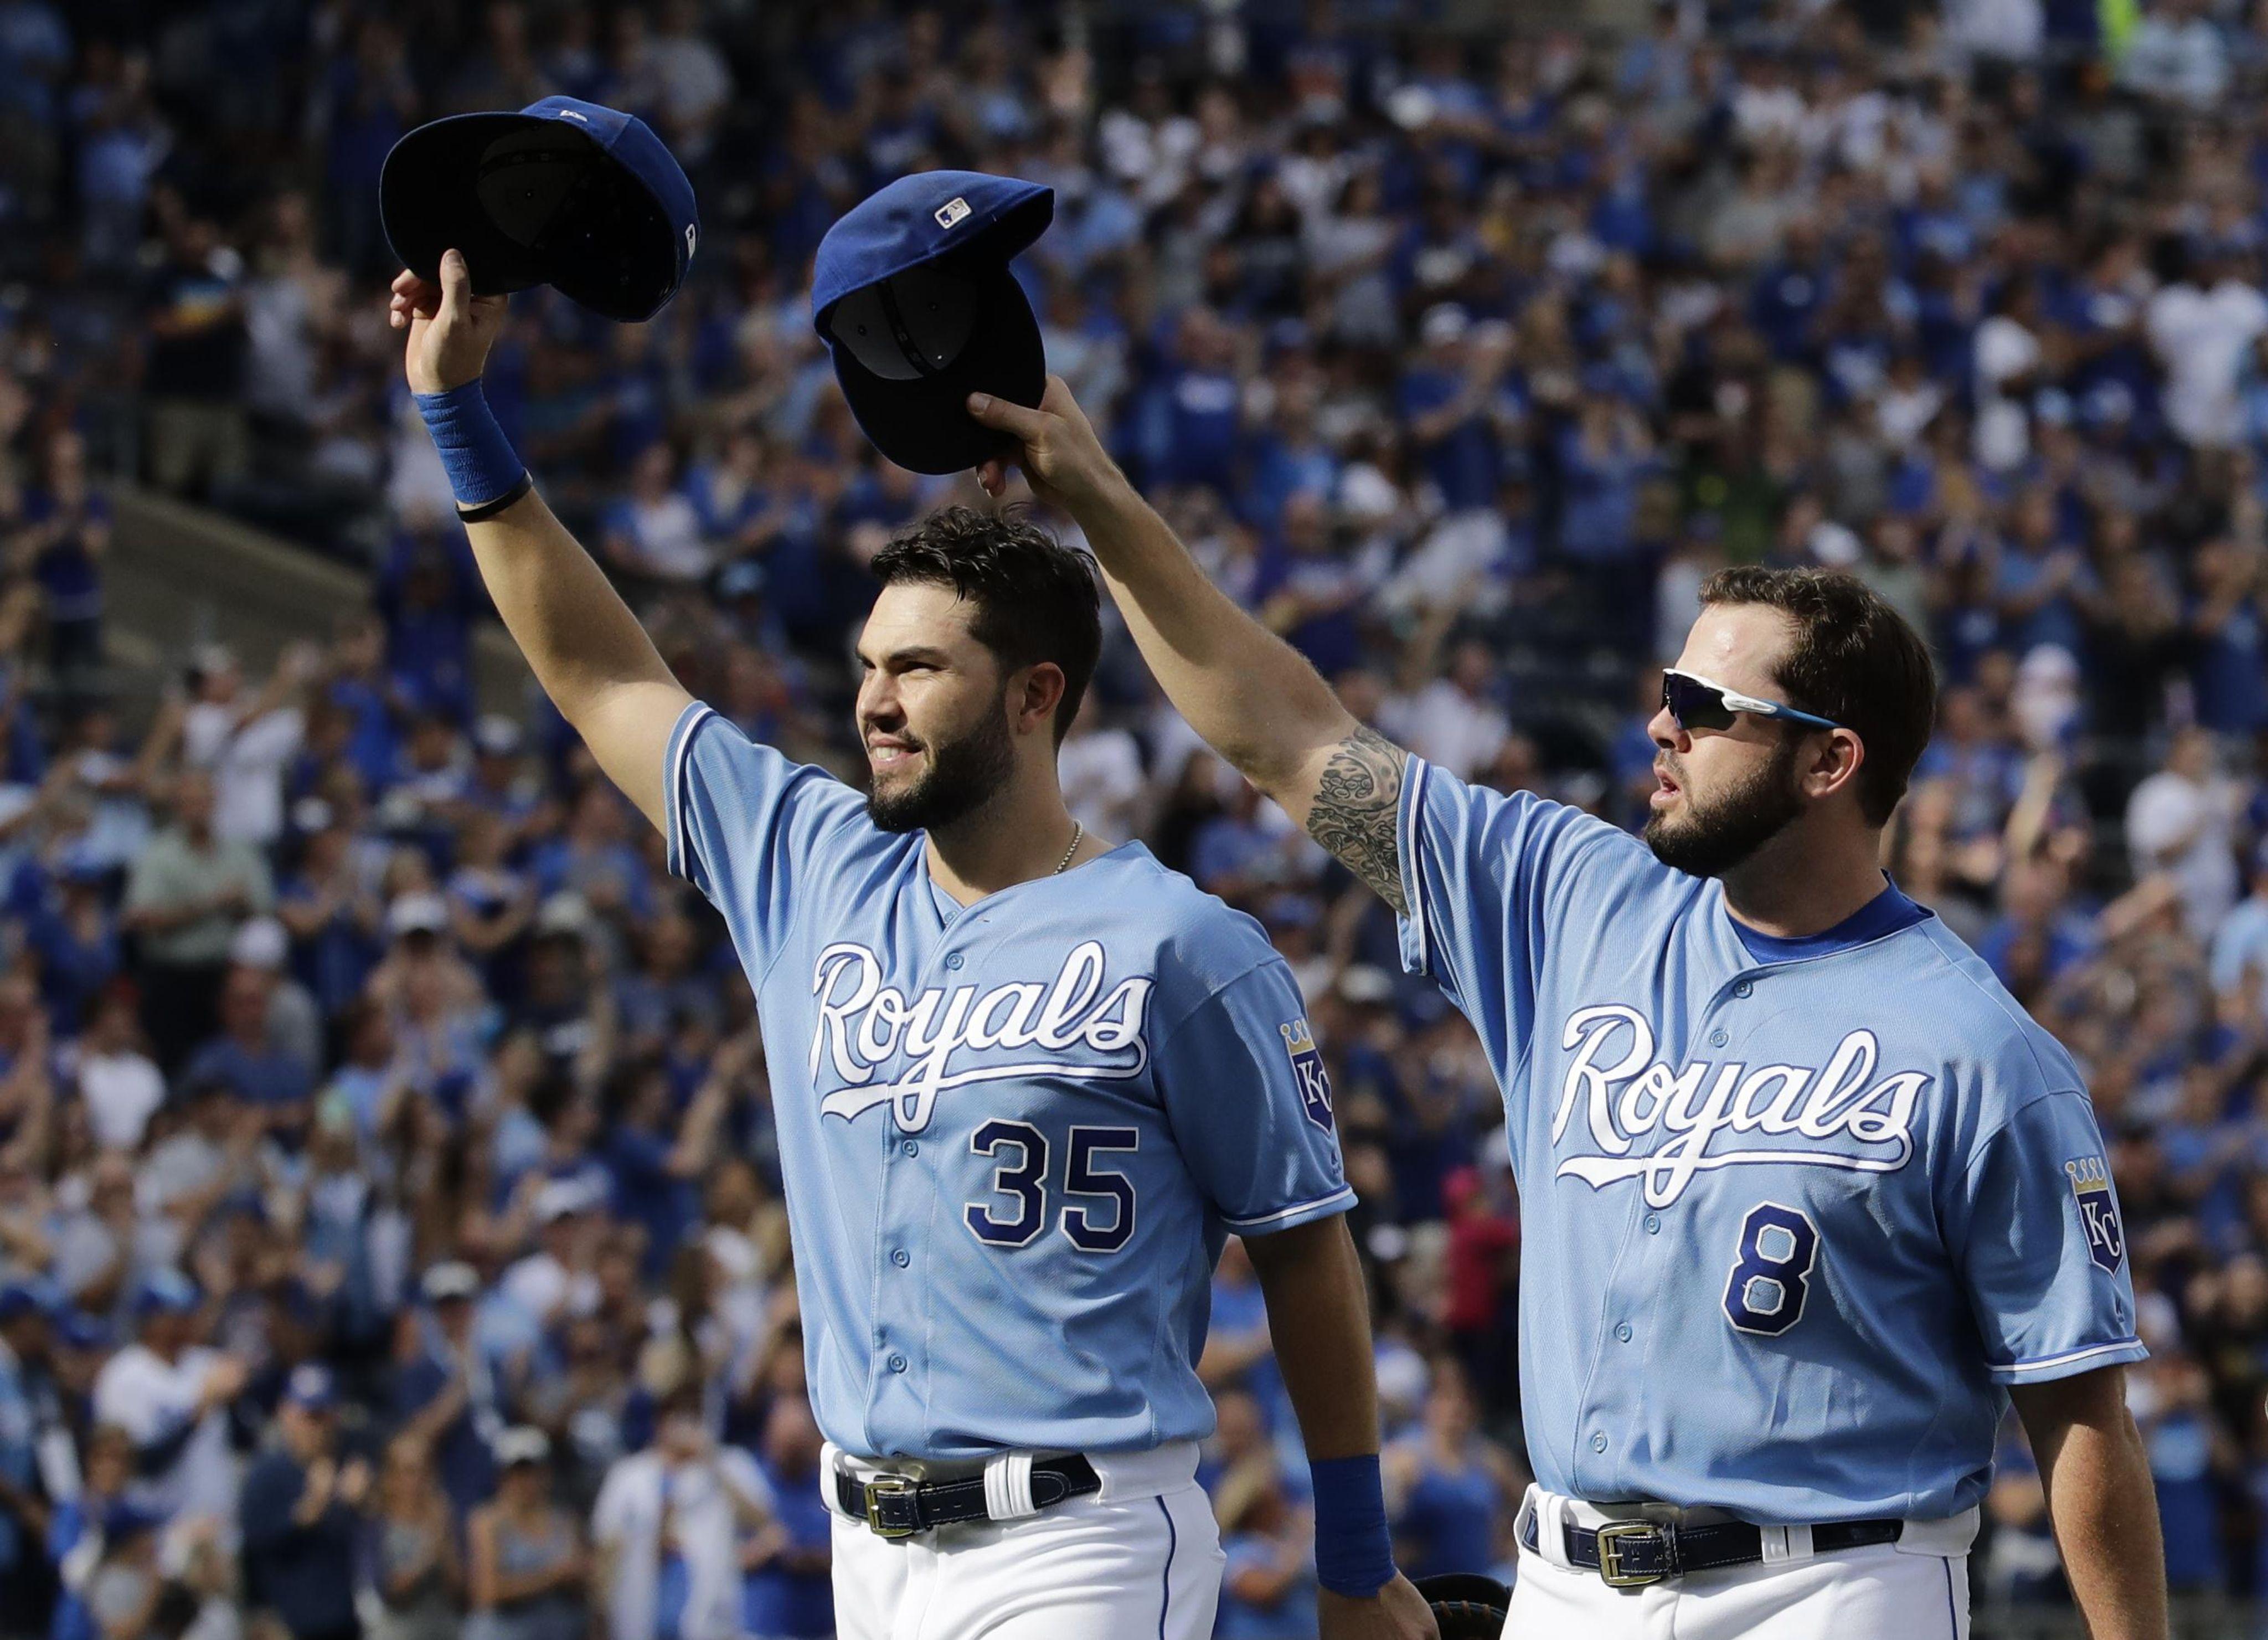 Royals_preview_baseball_46192_s4096x2961